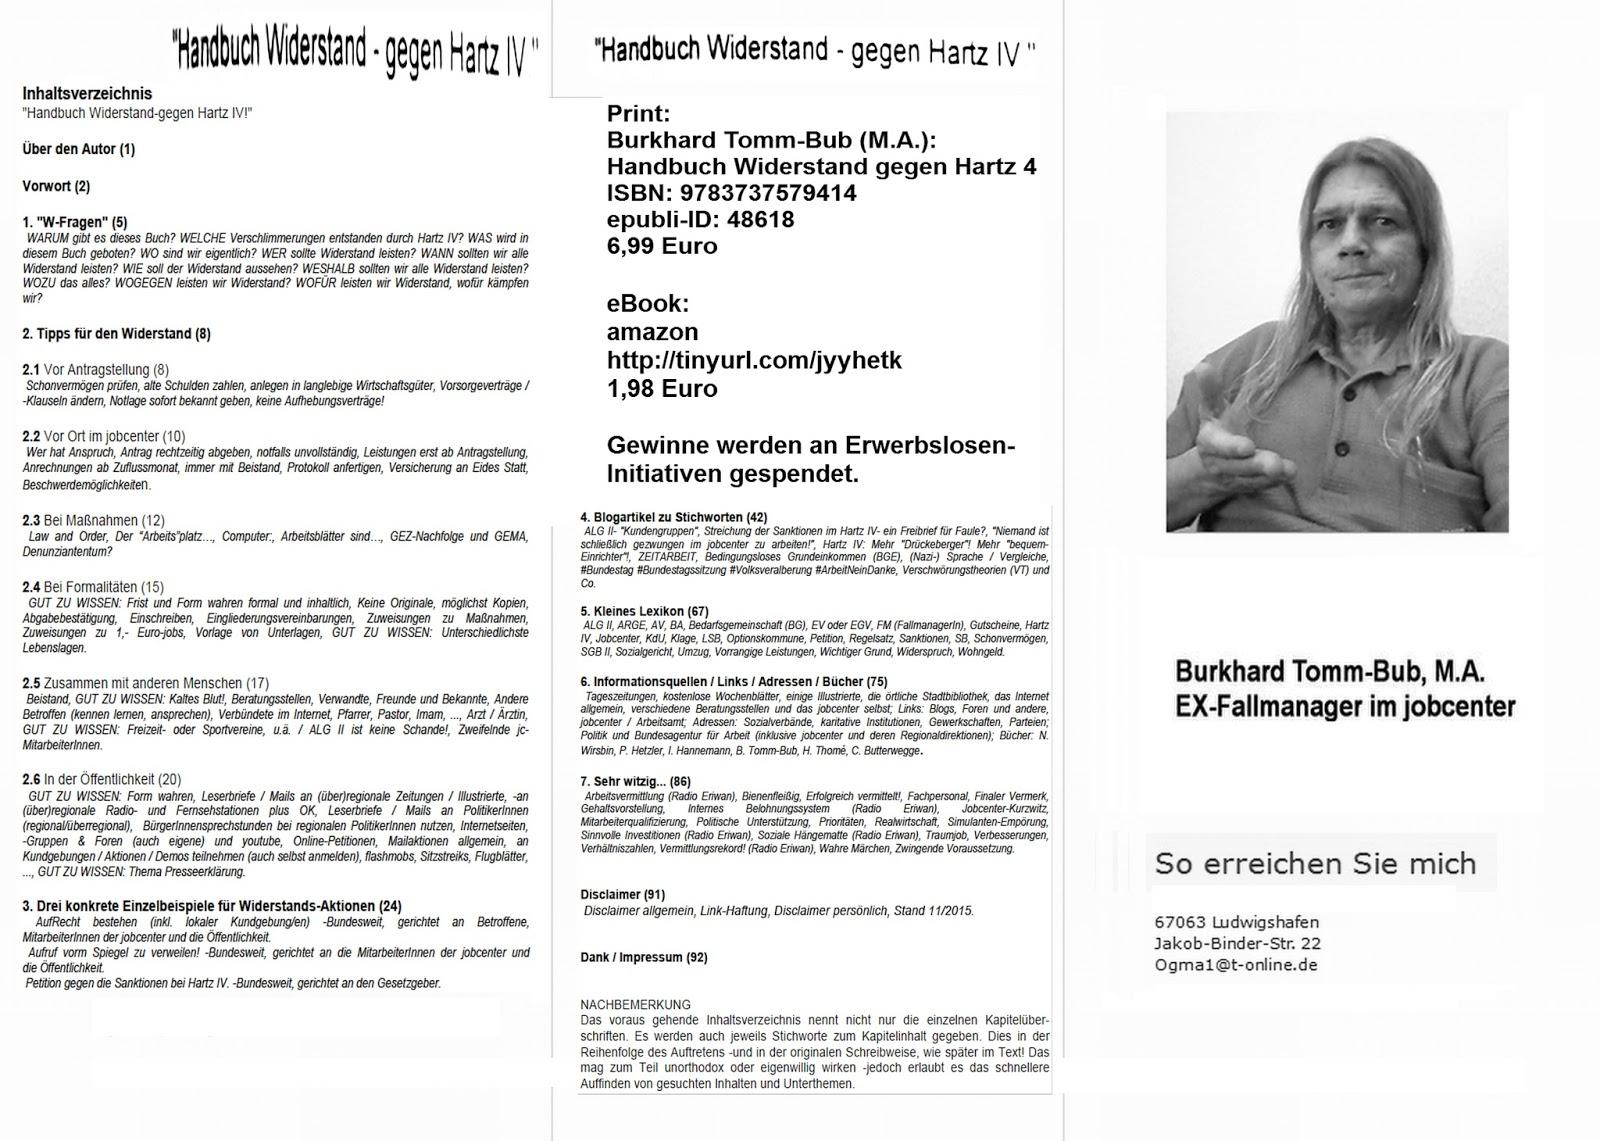 Handbuch Widerstand - gegen Hartz IV: FAQ Buch / Aktion